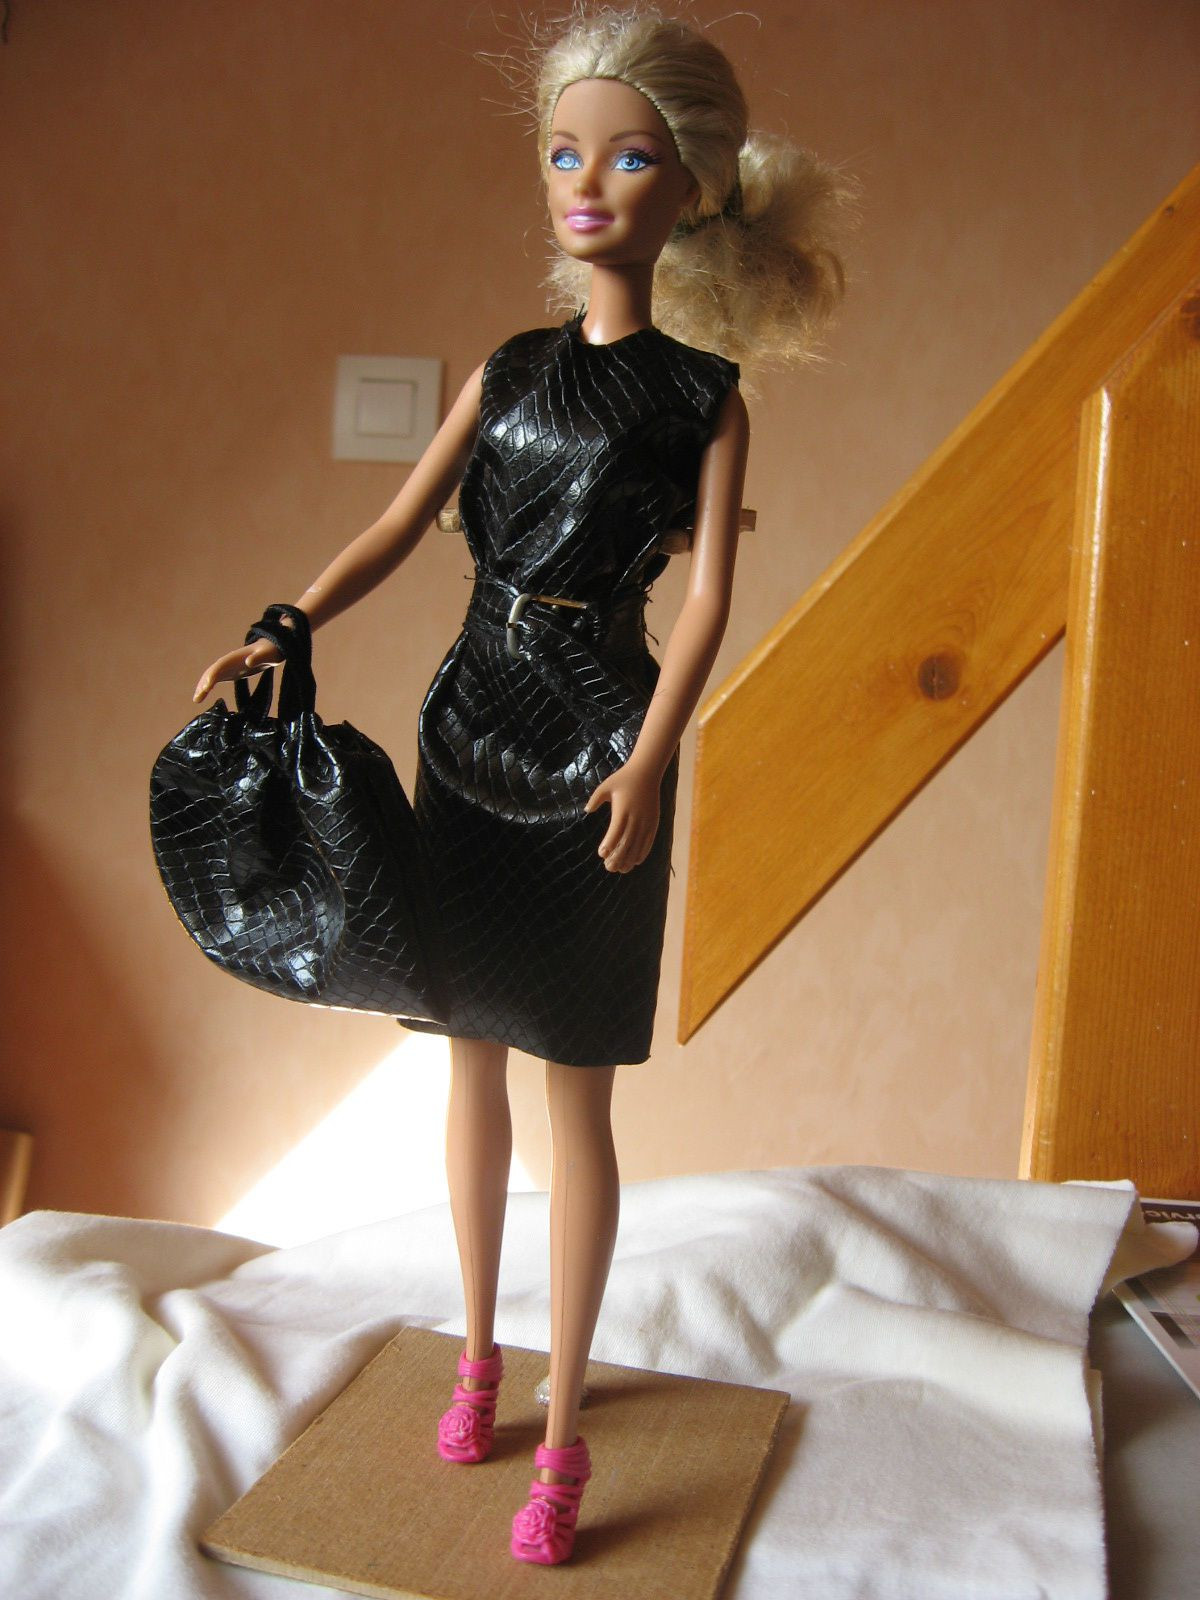 Robe cintrée noire imitation serpent Barbie sac assorti